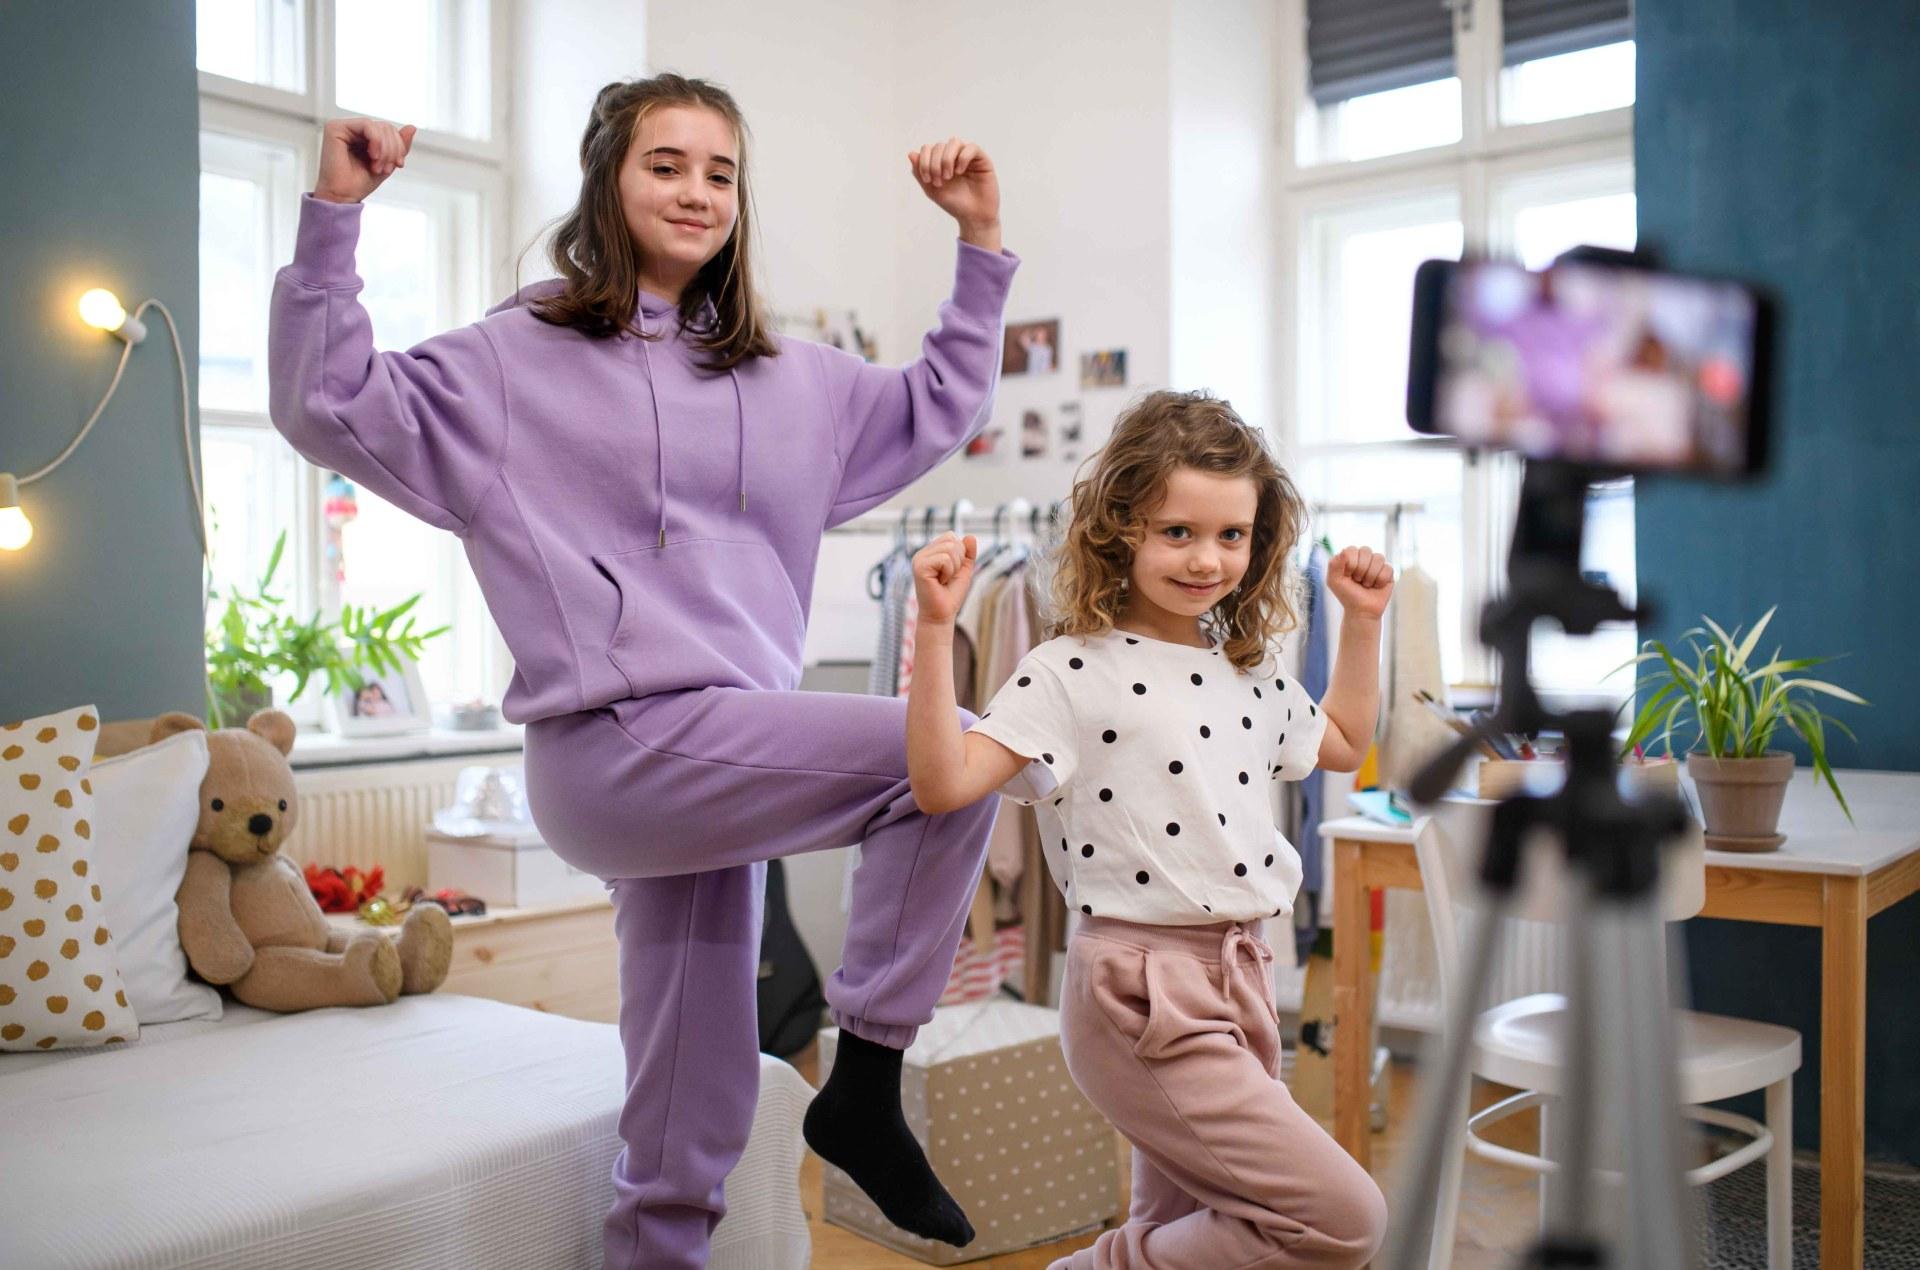 Kids recording a reel for TikTok